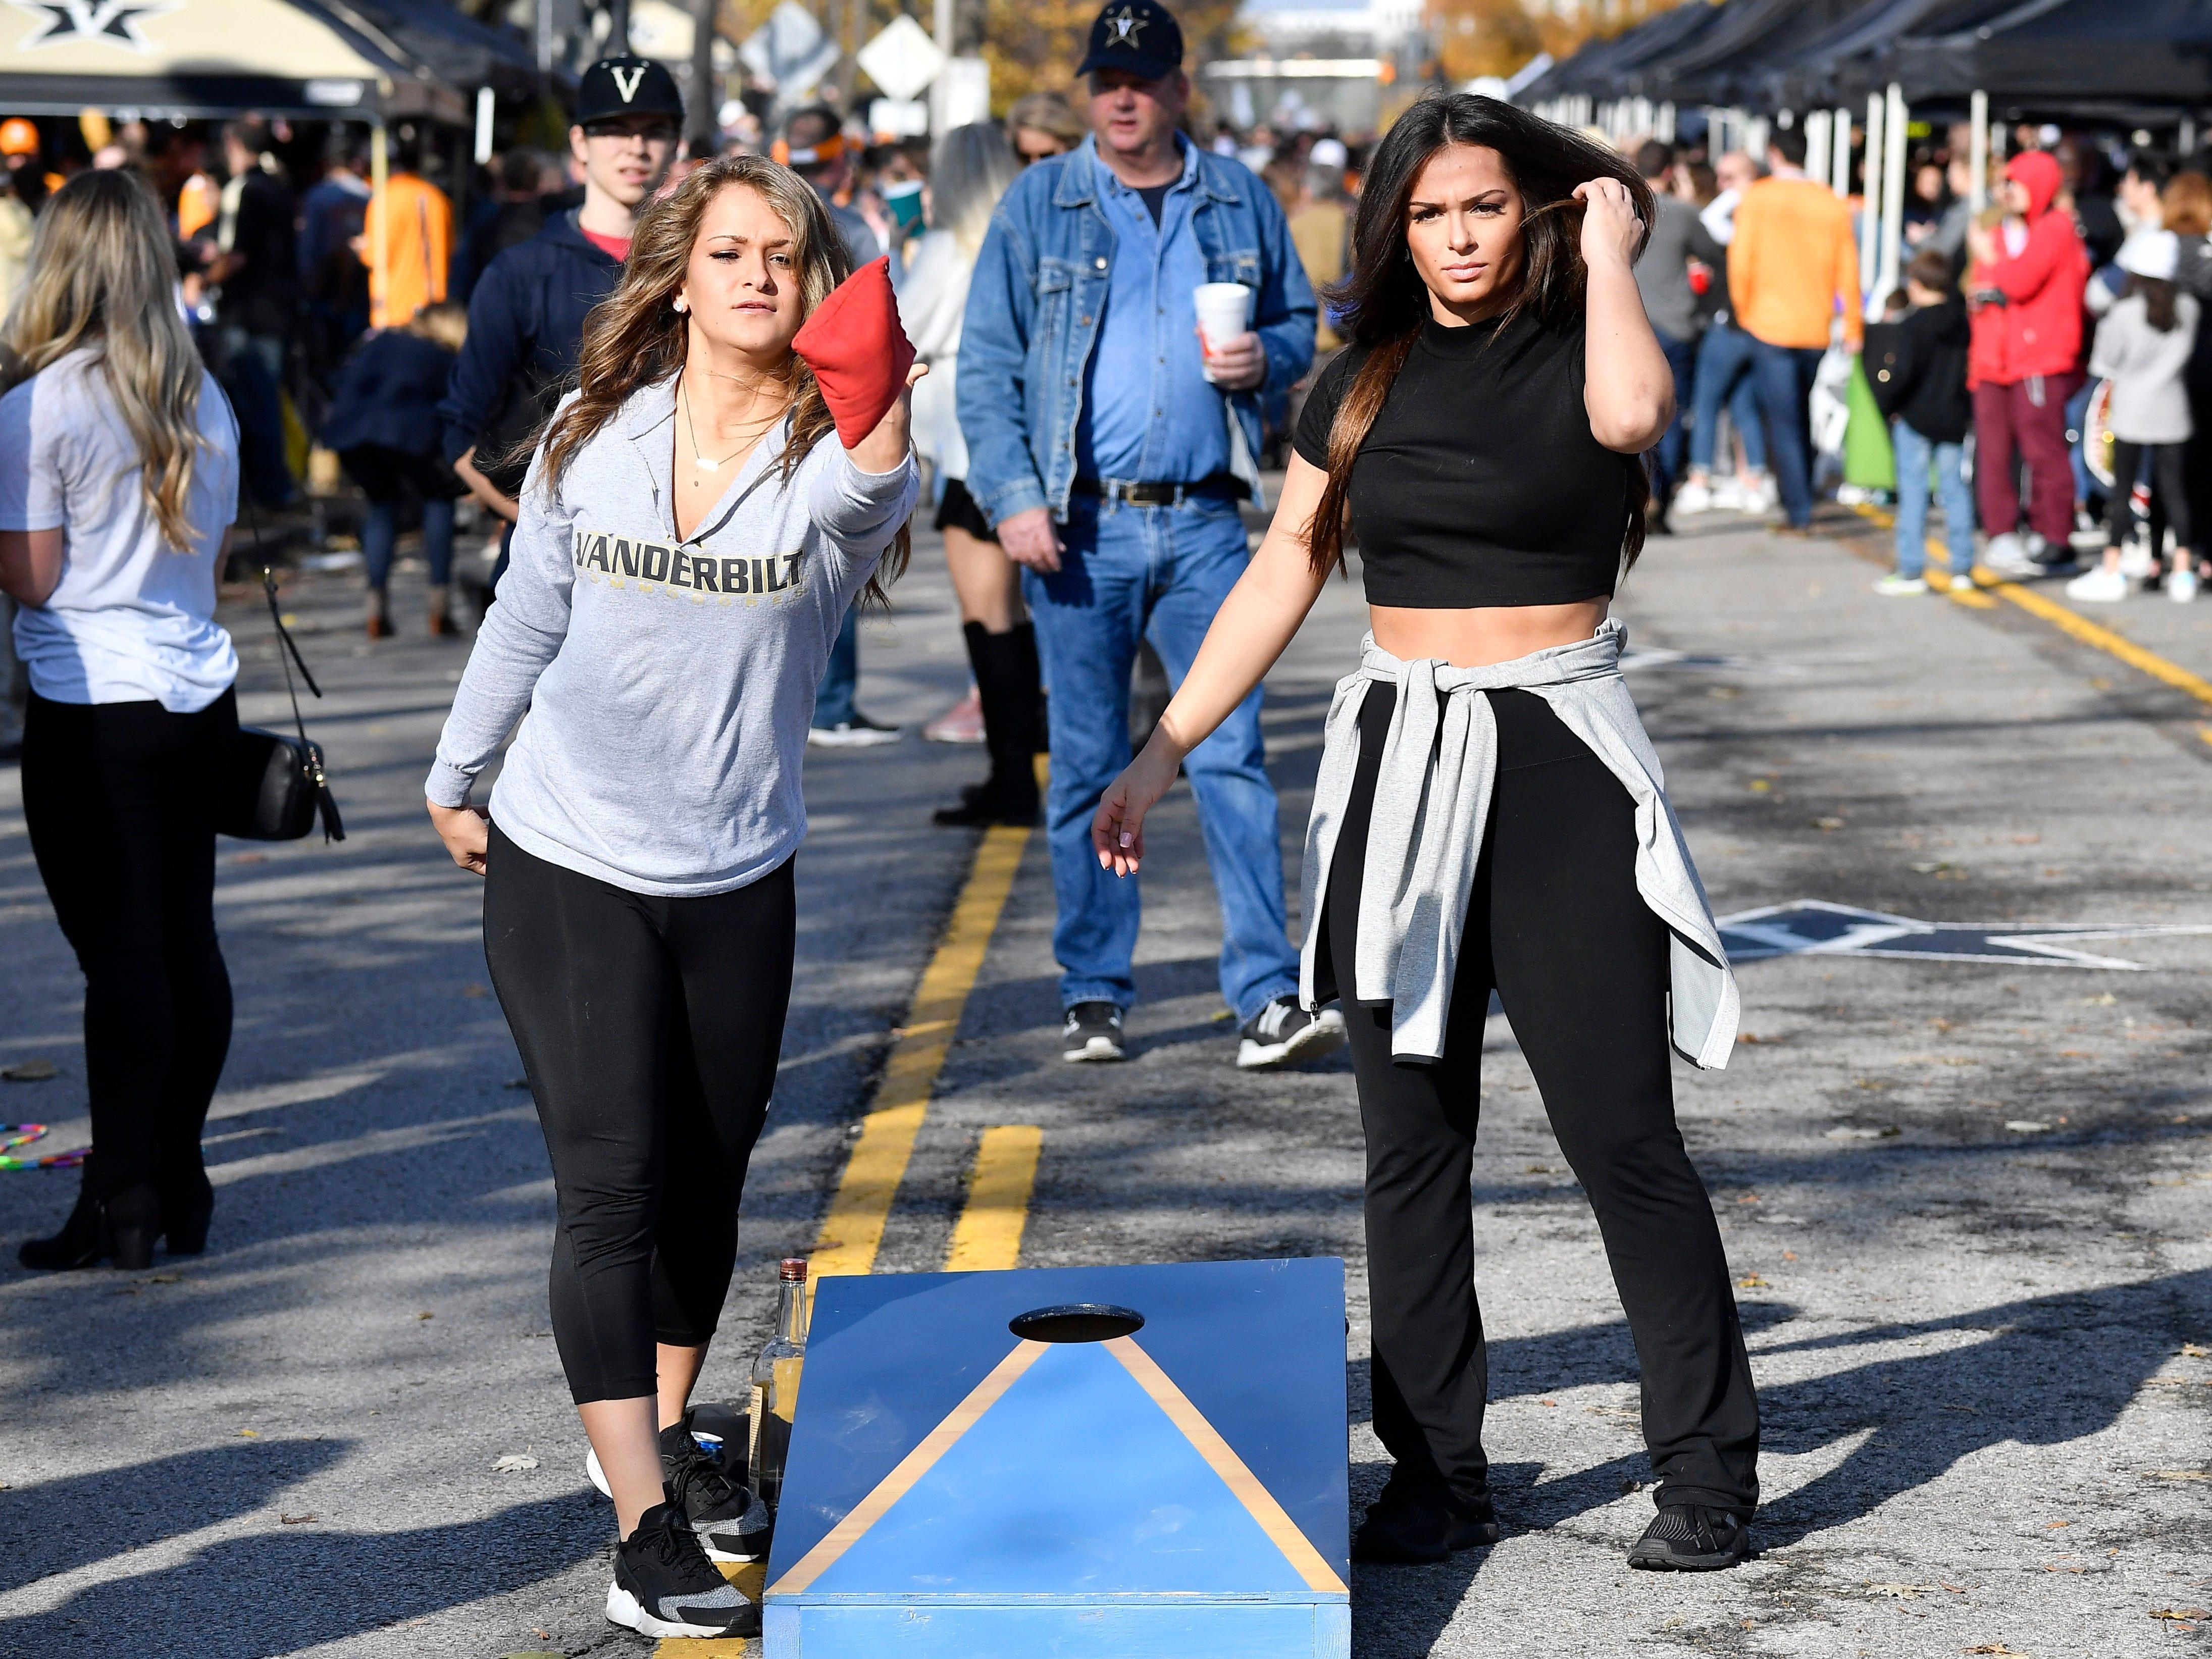 Sophia and Demi Patonis play corn hole before the game at Vanderbilt Stadium Saturday, Nov. 24, 2018, in Nashville, Tenn.